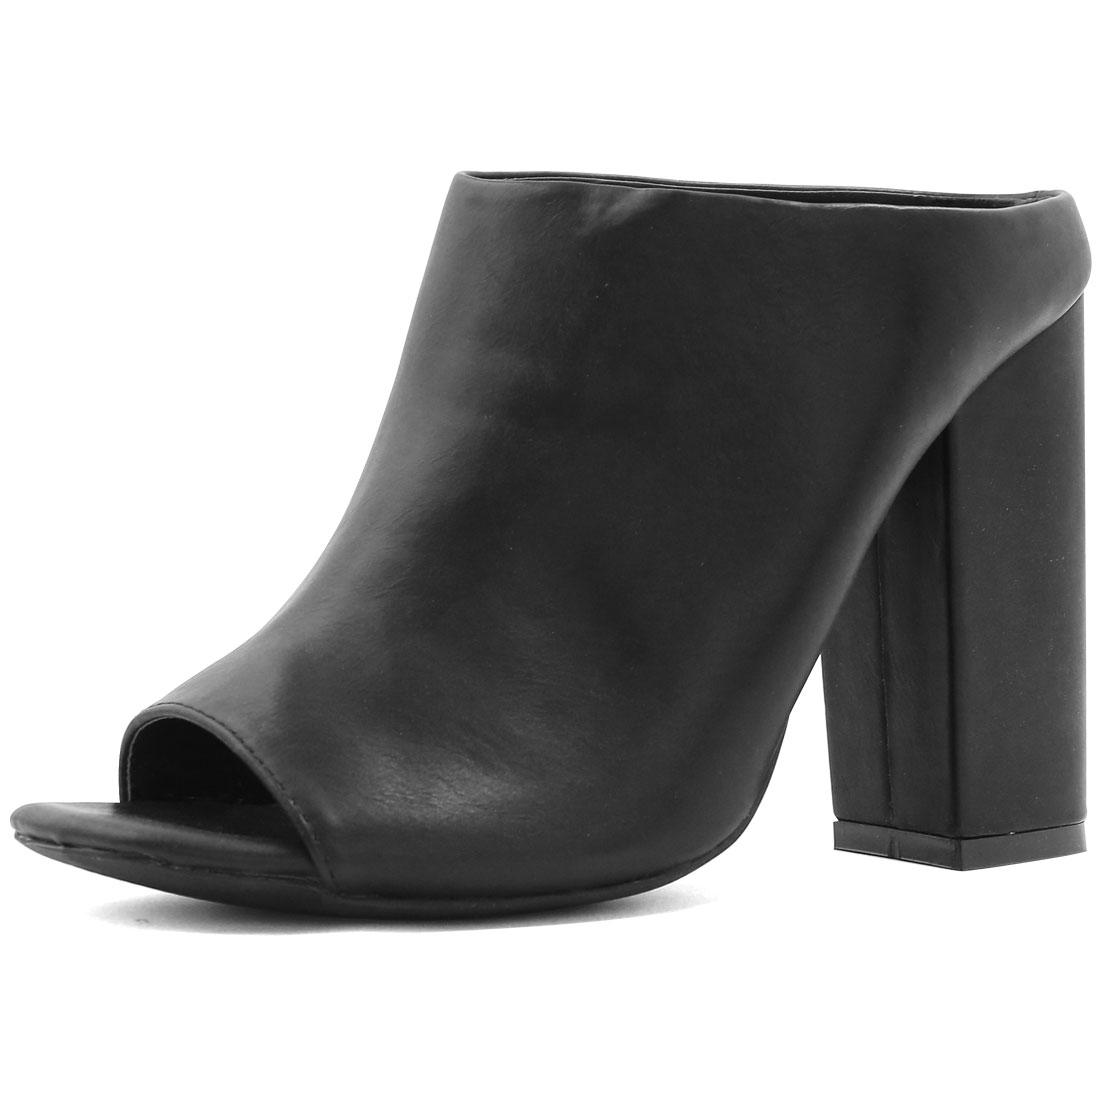 Woman Square Peep Toe Slip On Chunky High Heel Mules Black US 6.5